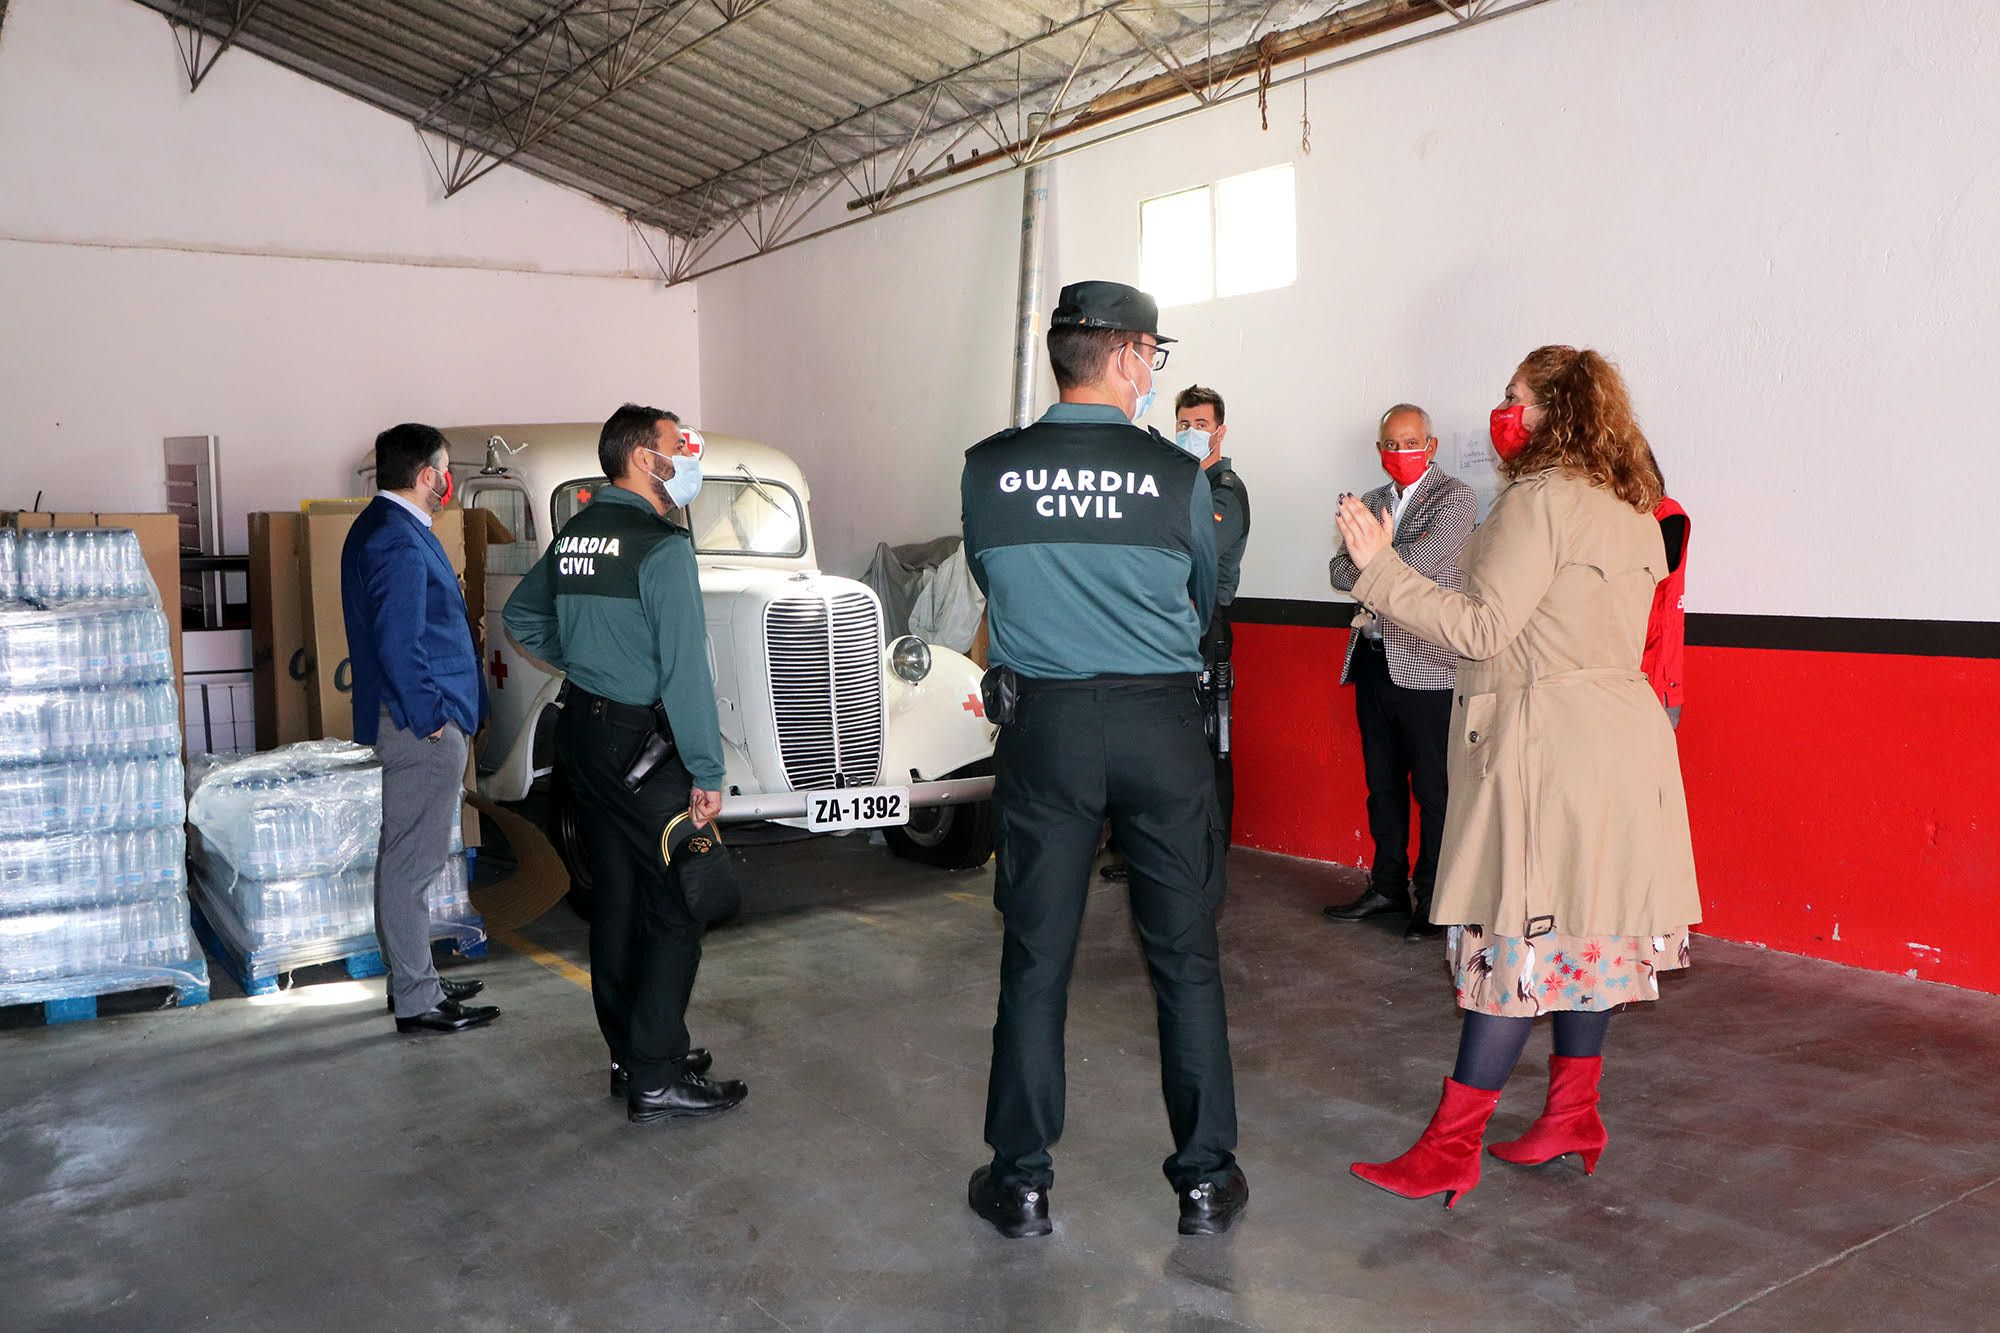 Cruz roja guardia civil (4)